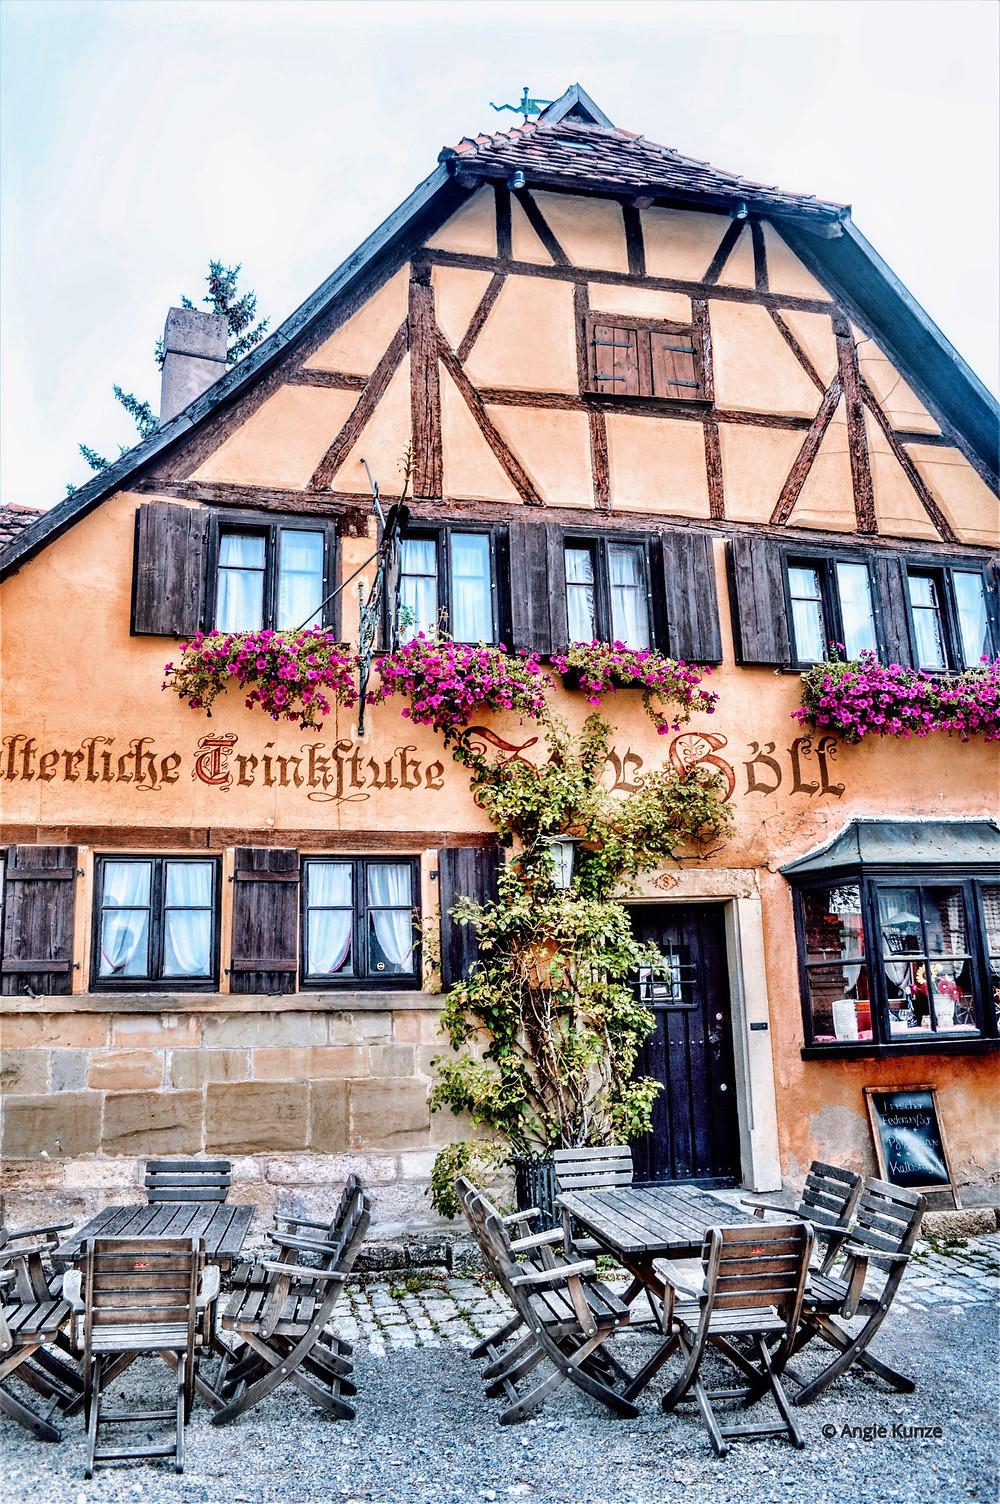 Zur Holl Restaurant, Rothenburg ob der Tauber, Bavaria Germany. Historic places to eat.